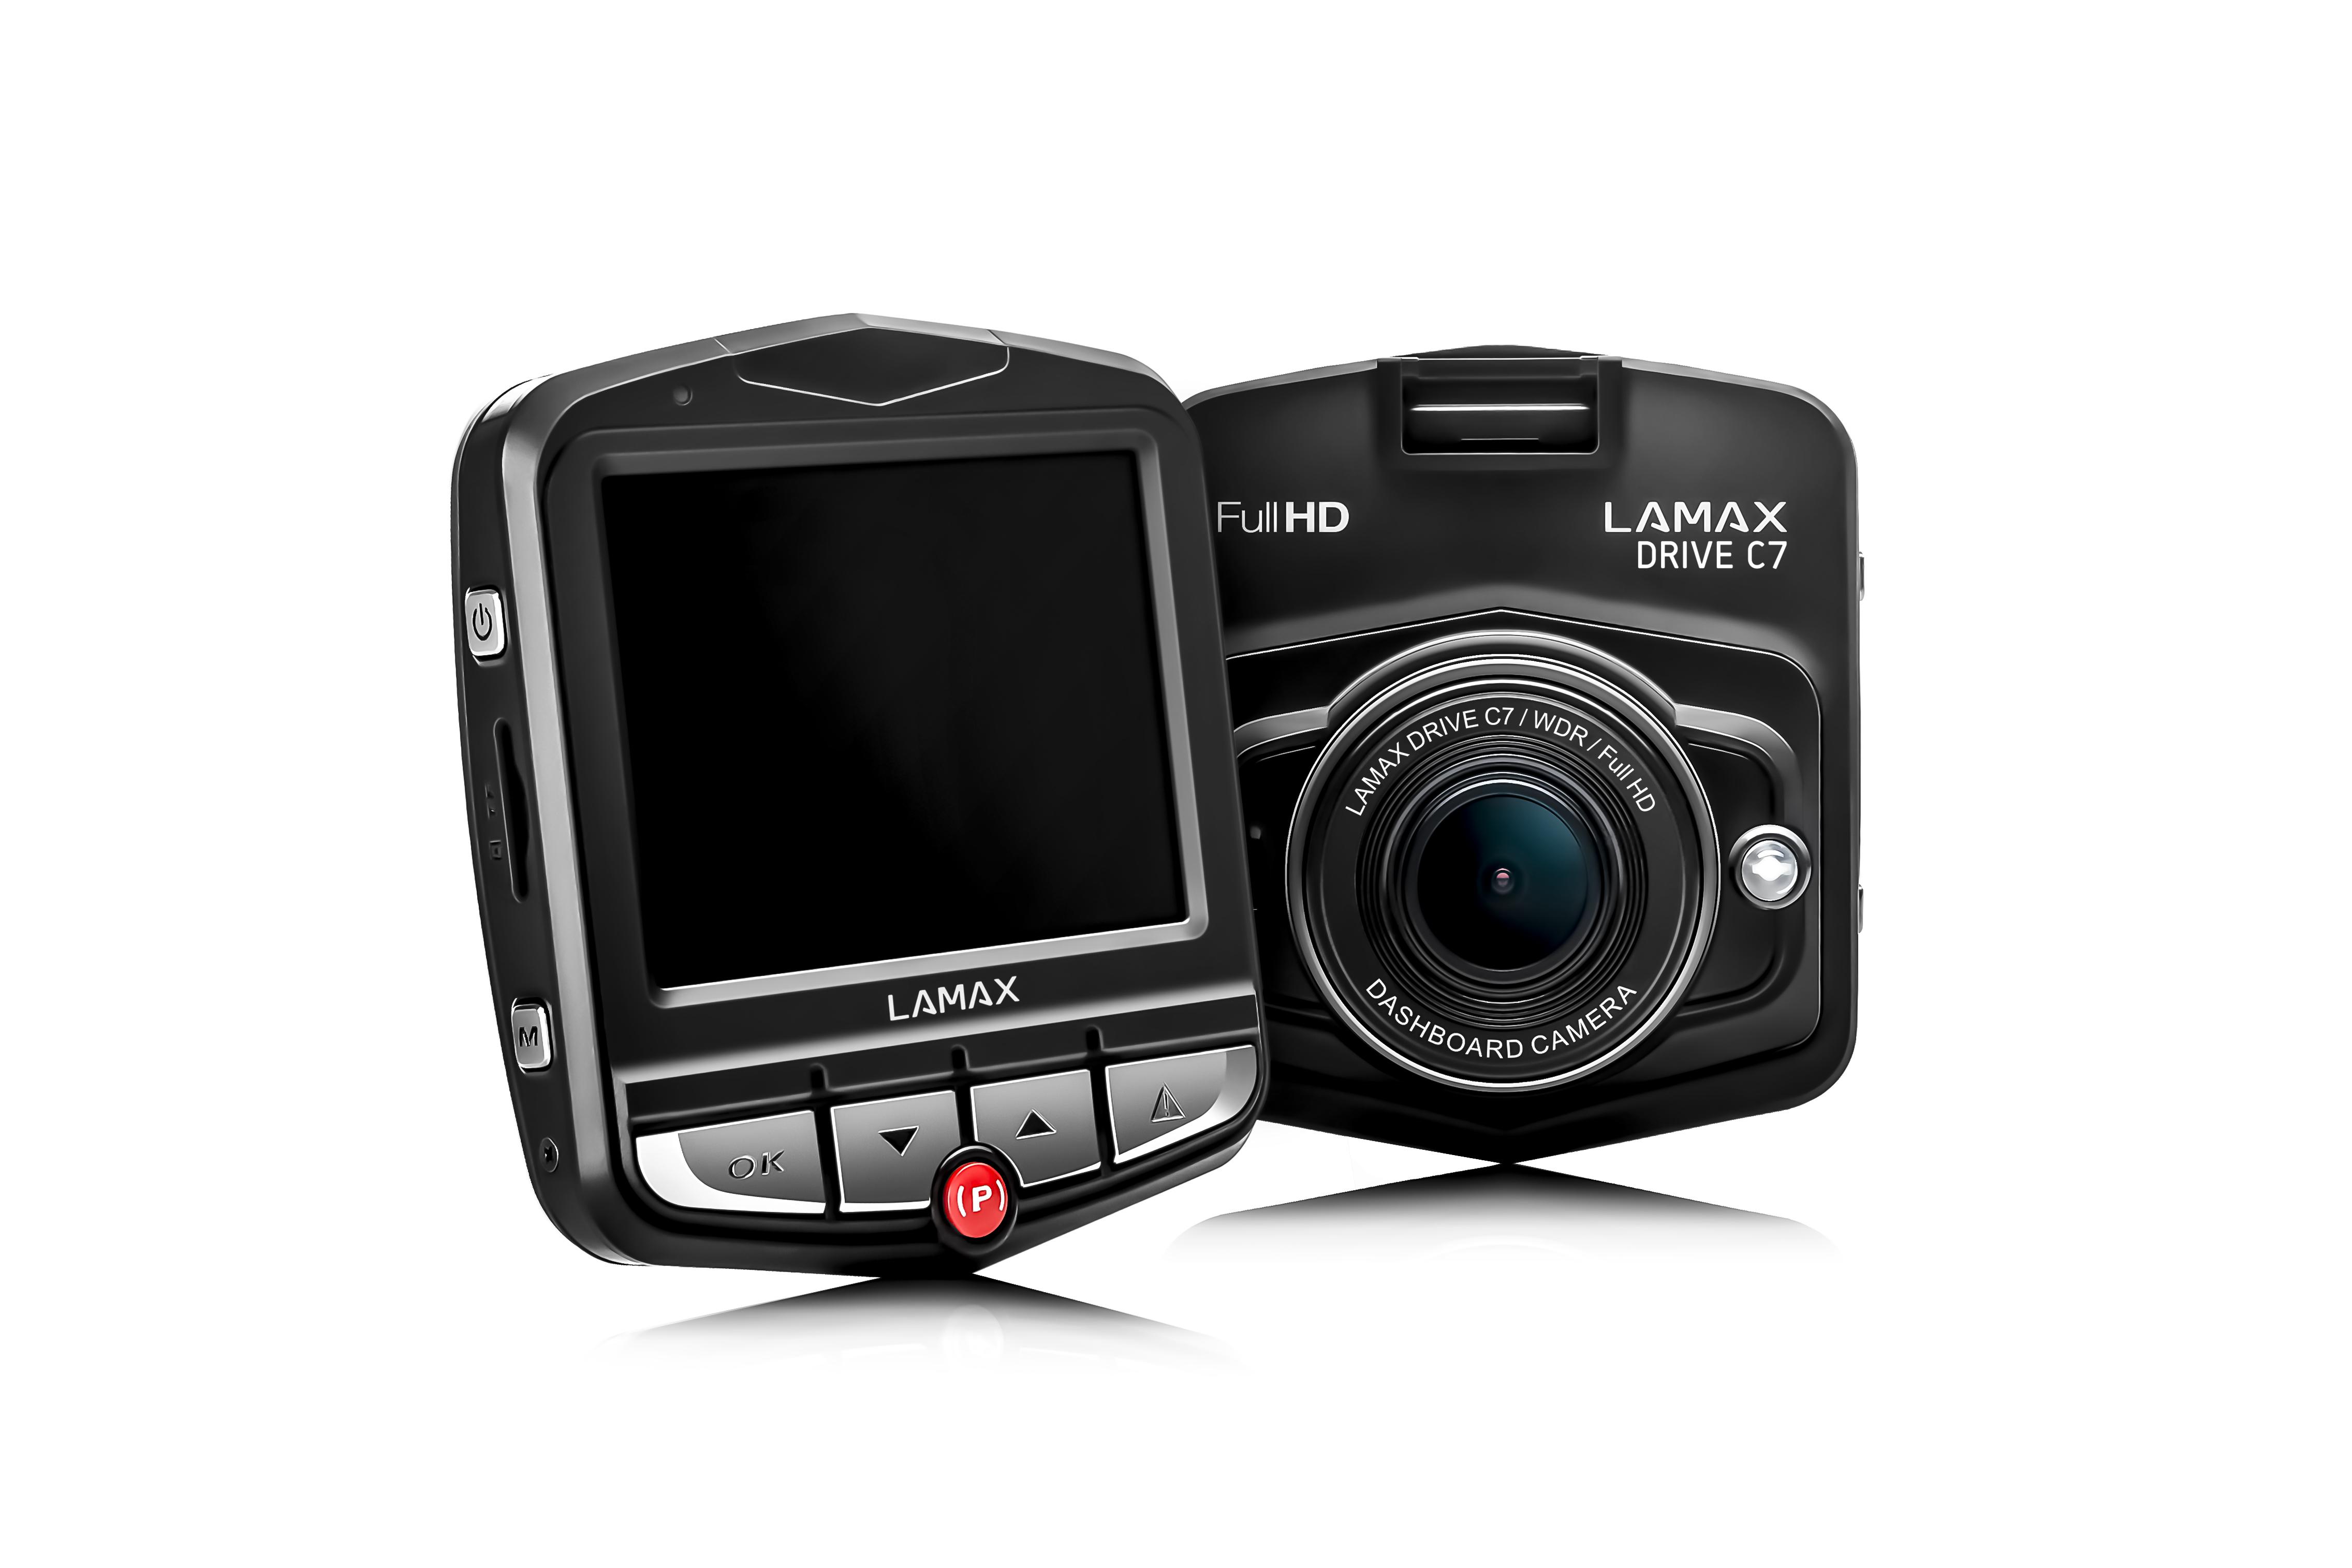 01-LAMAX-DRIVE-C5-8594175350319-camera-c